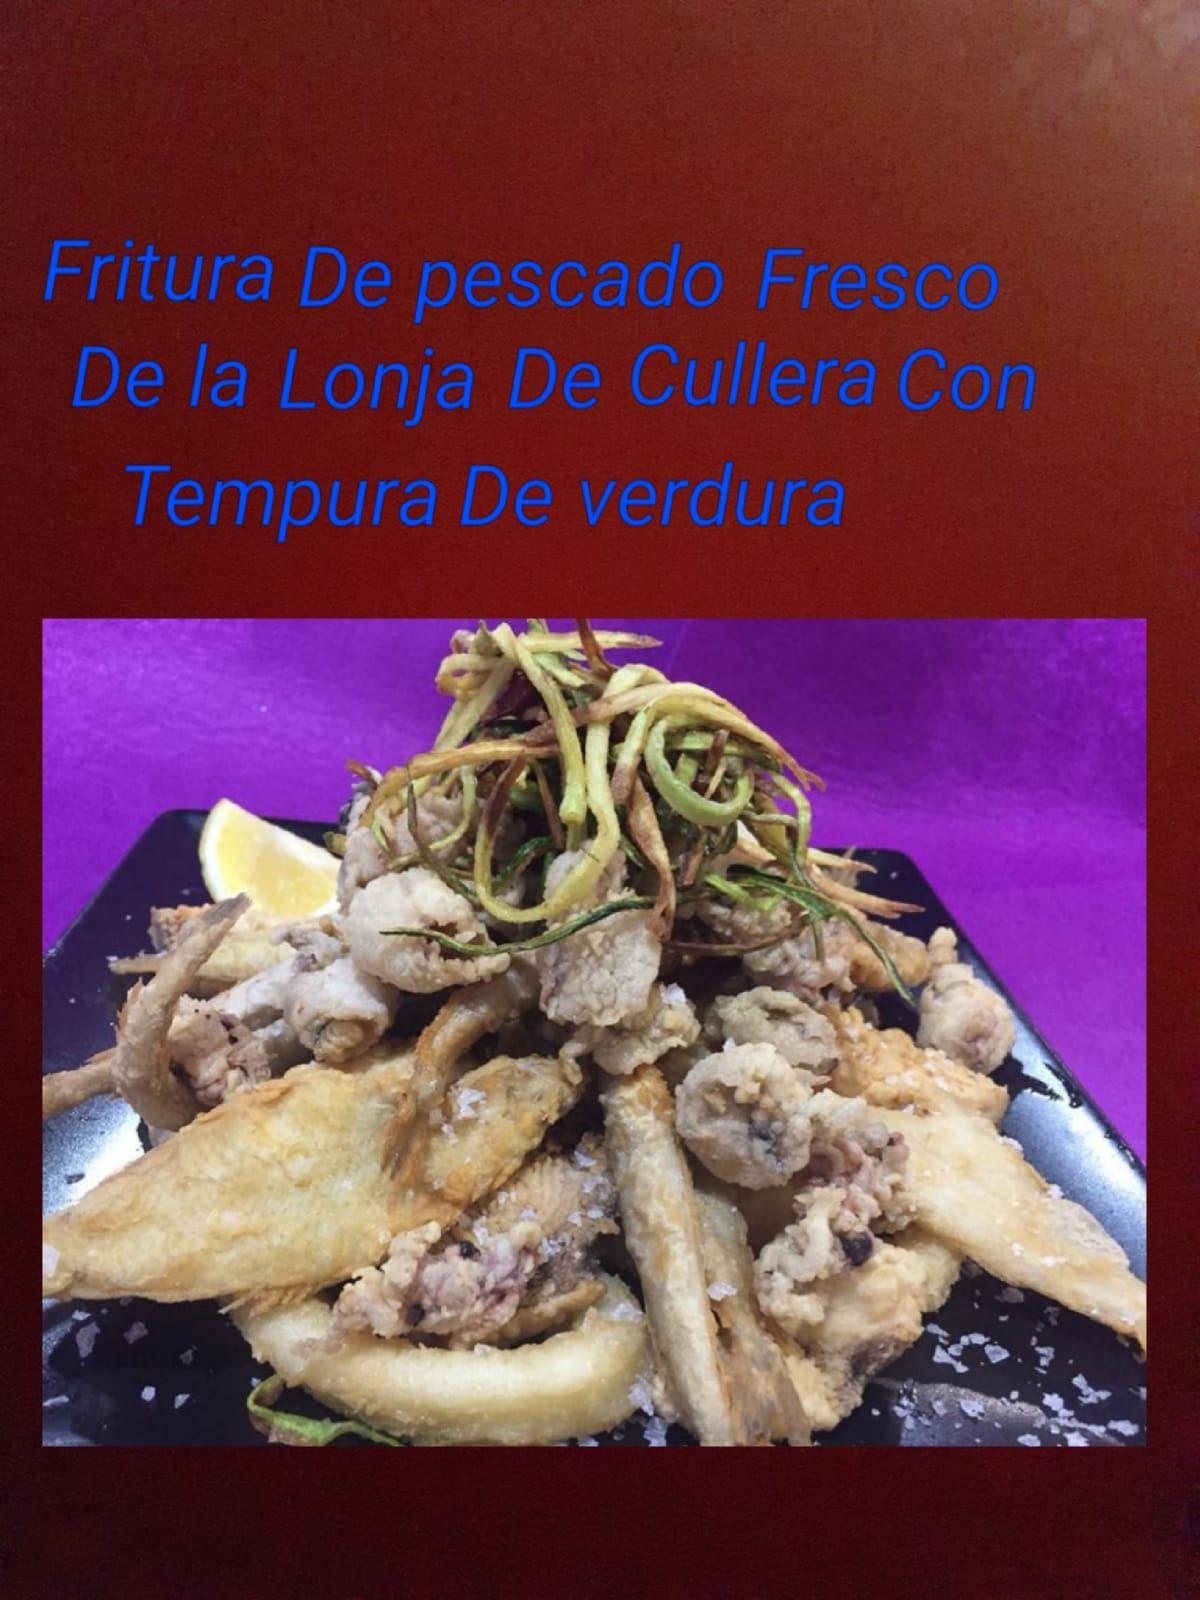 Fritura de pescado fresco de la lonja de Cullera con tempura de verdura